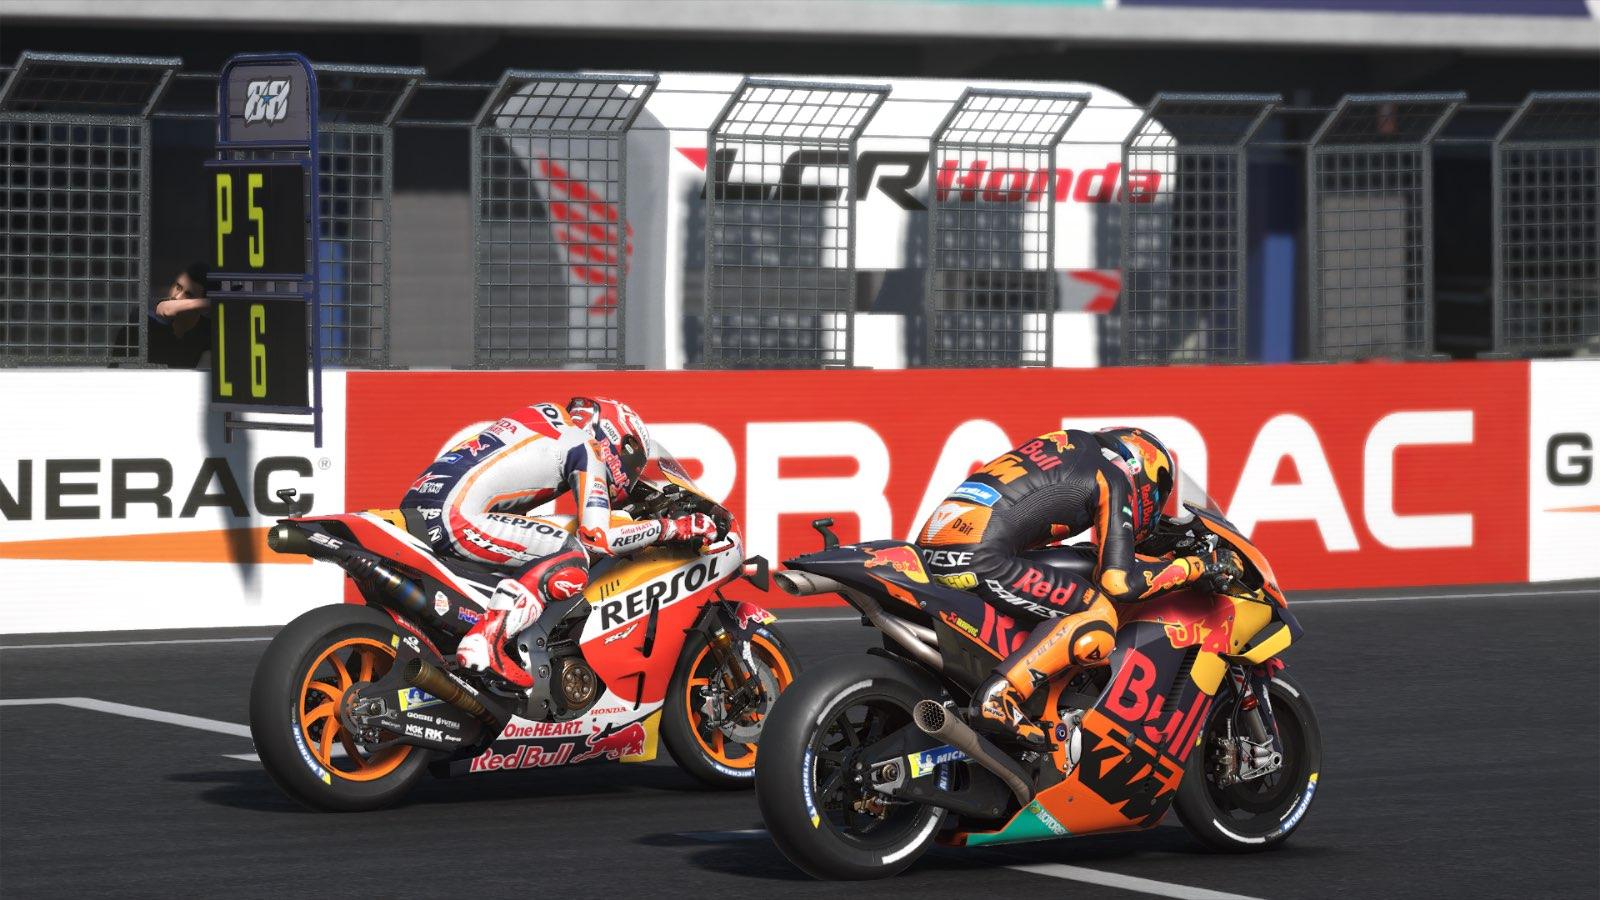 MotoGP20 Videogame - Graphic Editors